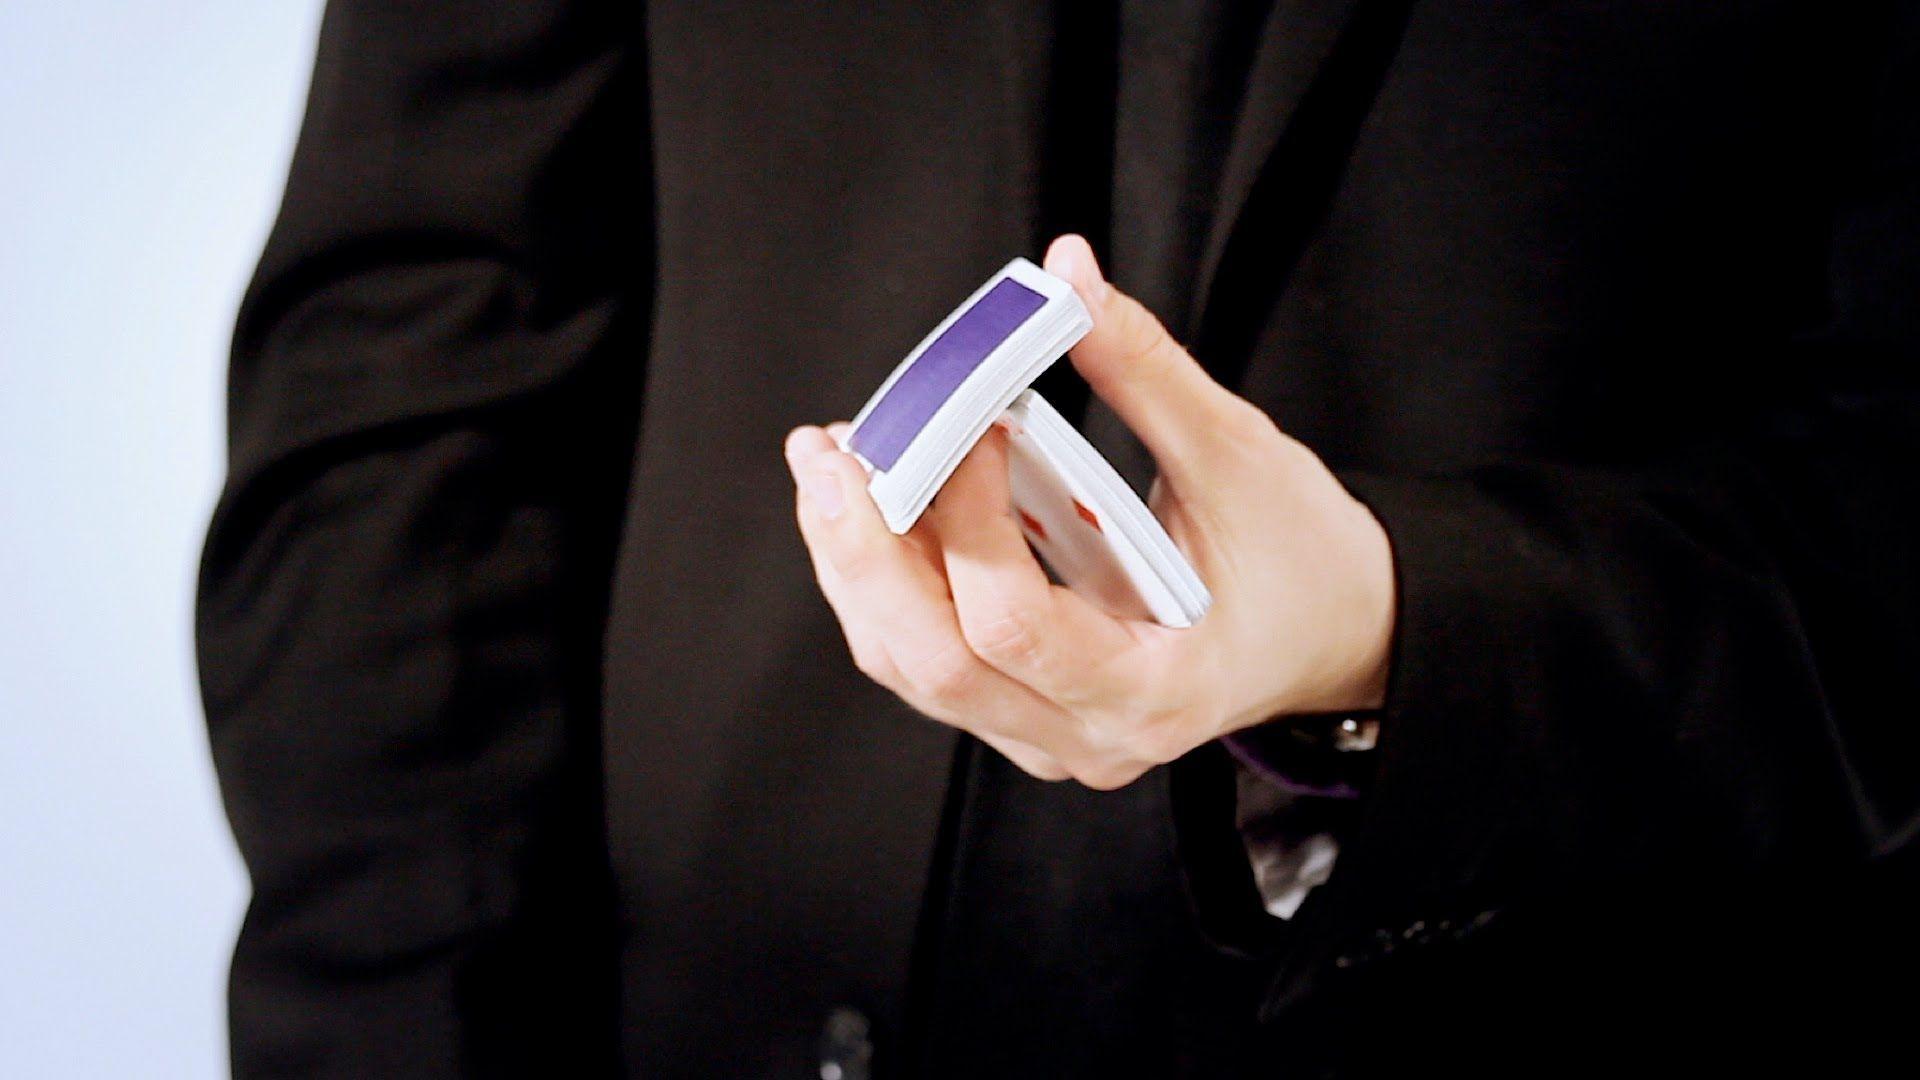 Learn Basic Sleight of Hand Card Tricks